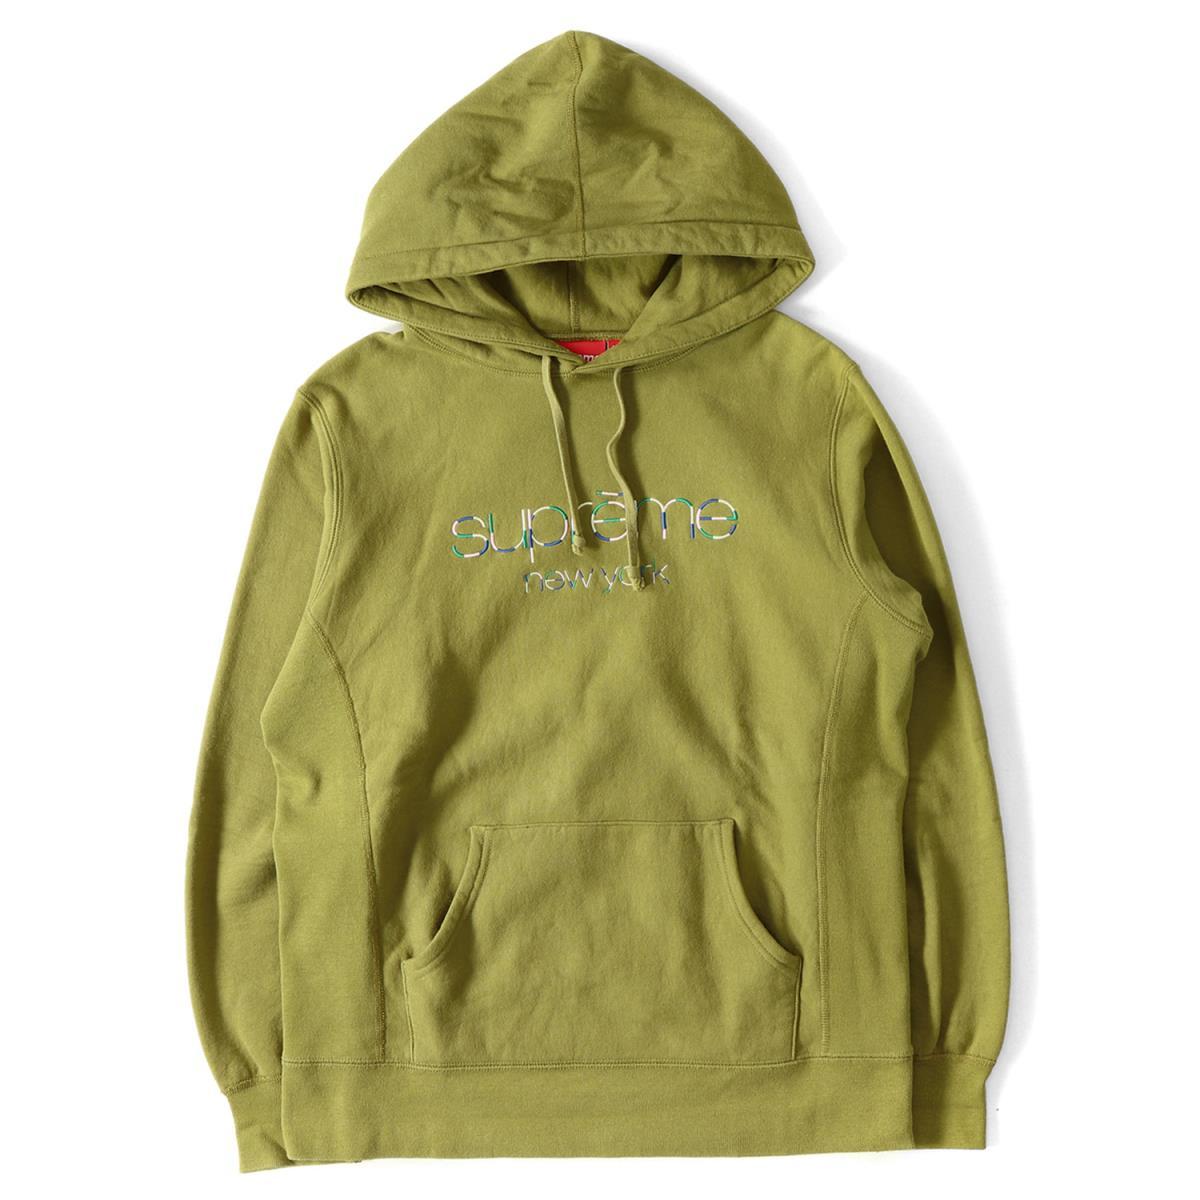 Supreme (シュプリーム) 17S/S クラシックロゴ刺繍スウェットパーカー(Multi Color Classic Logo Hooded) オリーブ M 【美品】【メンズ】【K2022】【中古】【あす楽☆対応可】